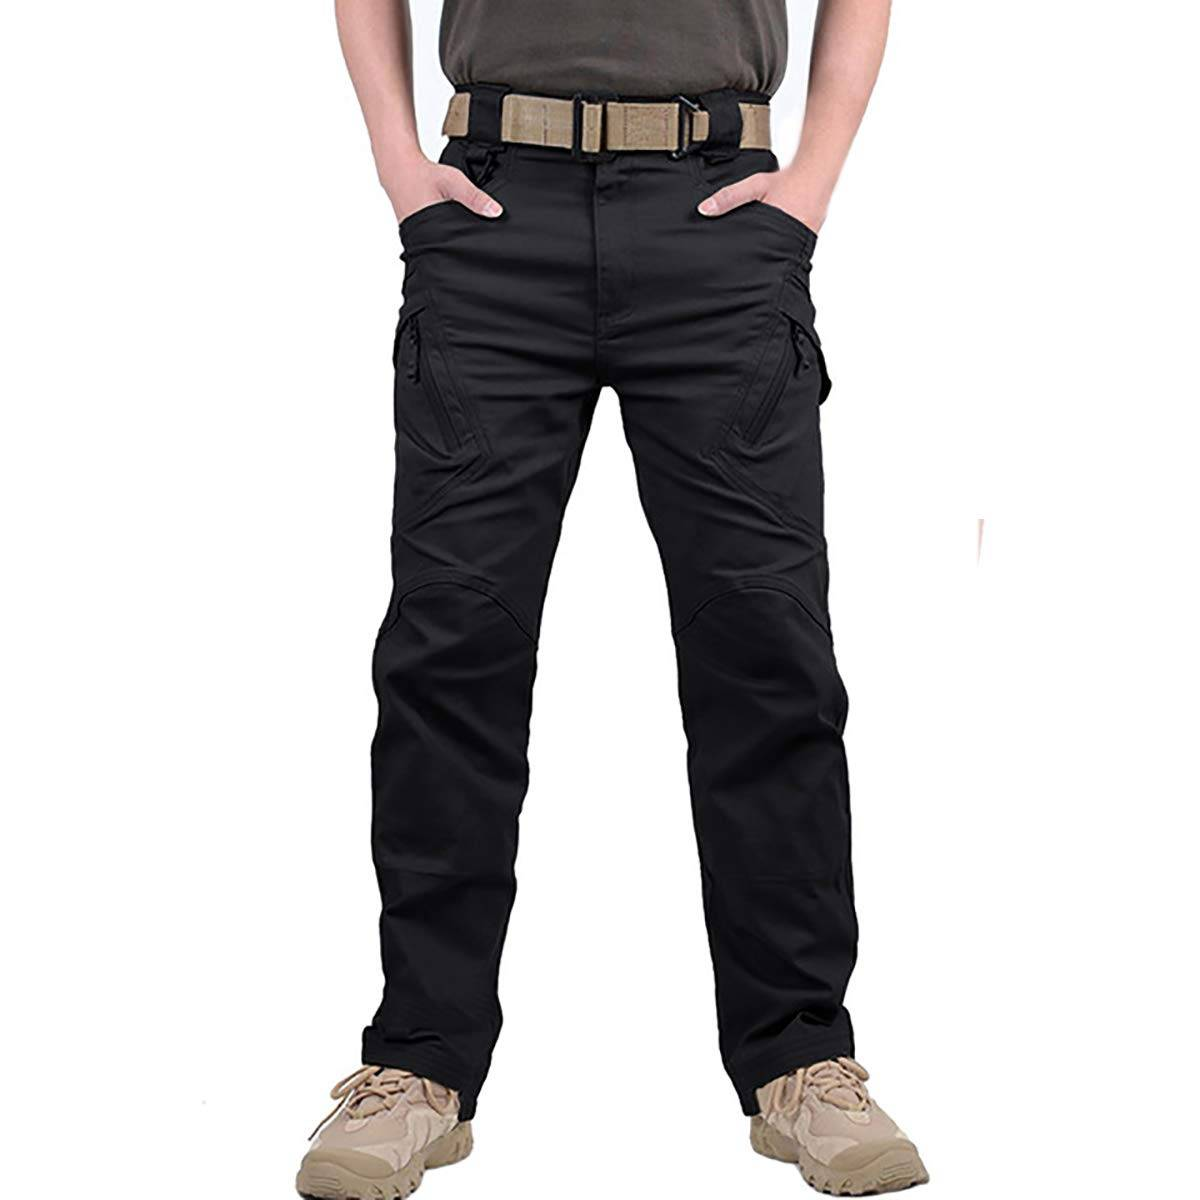 Men cargo trouser Black CT-011